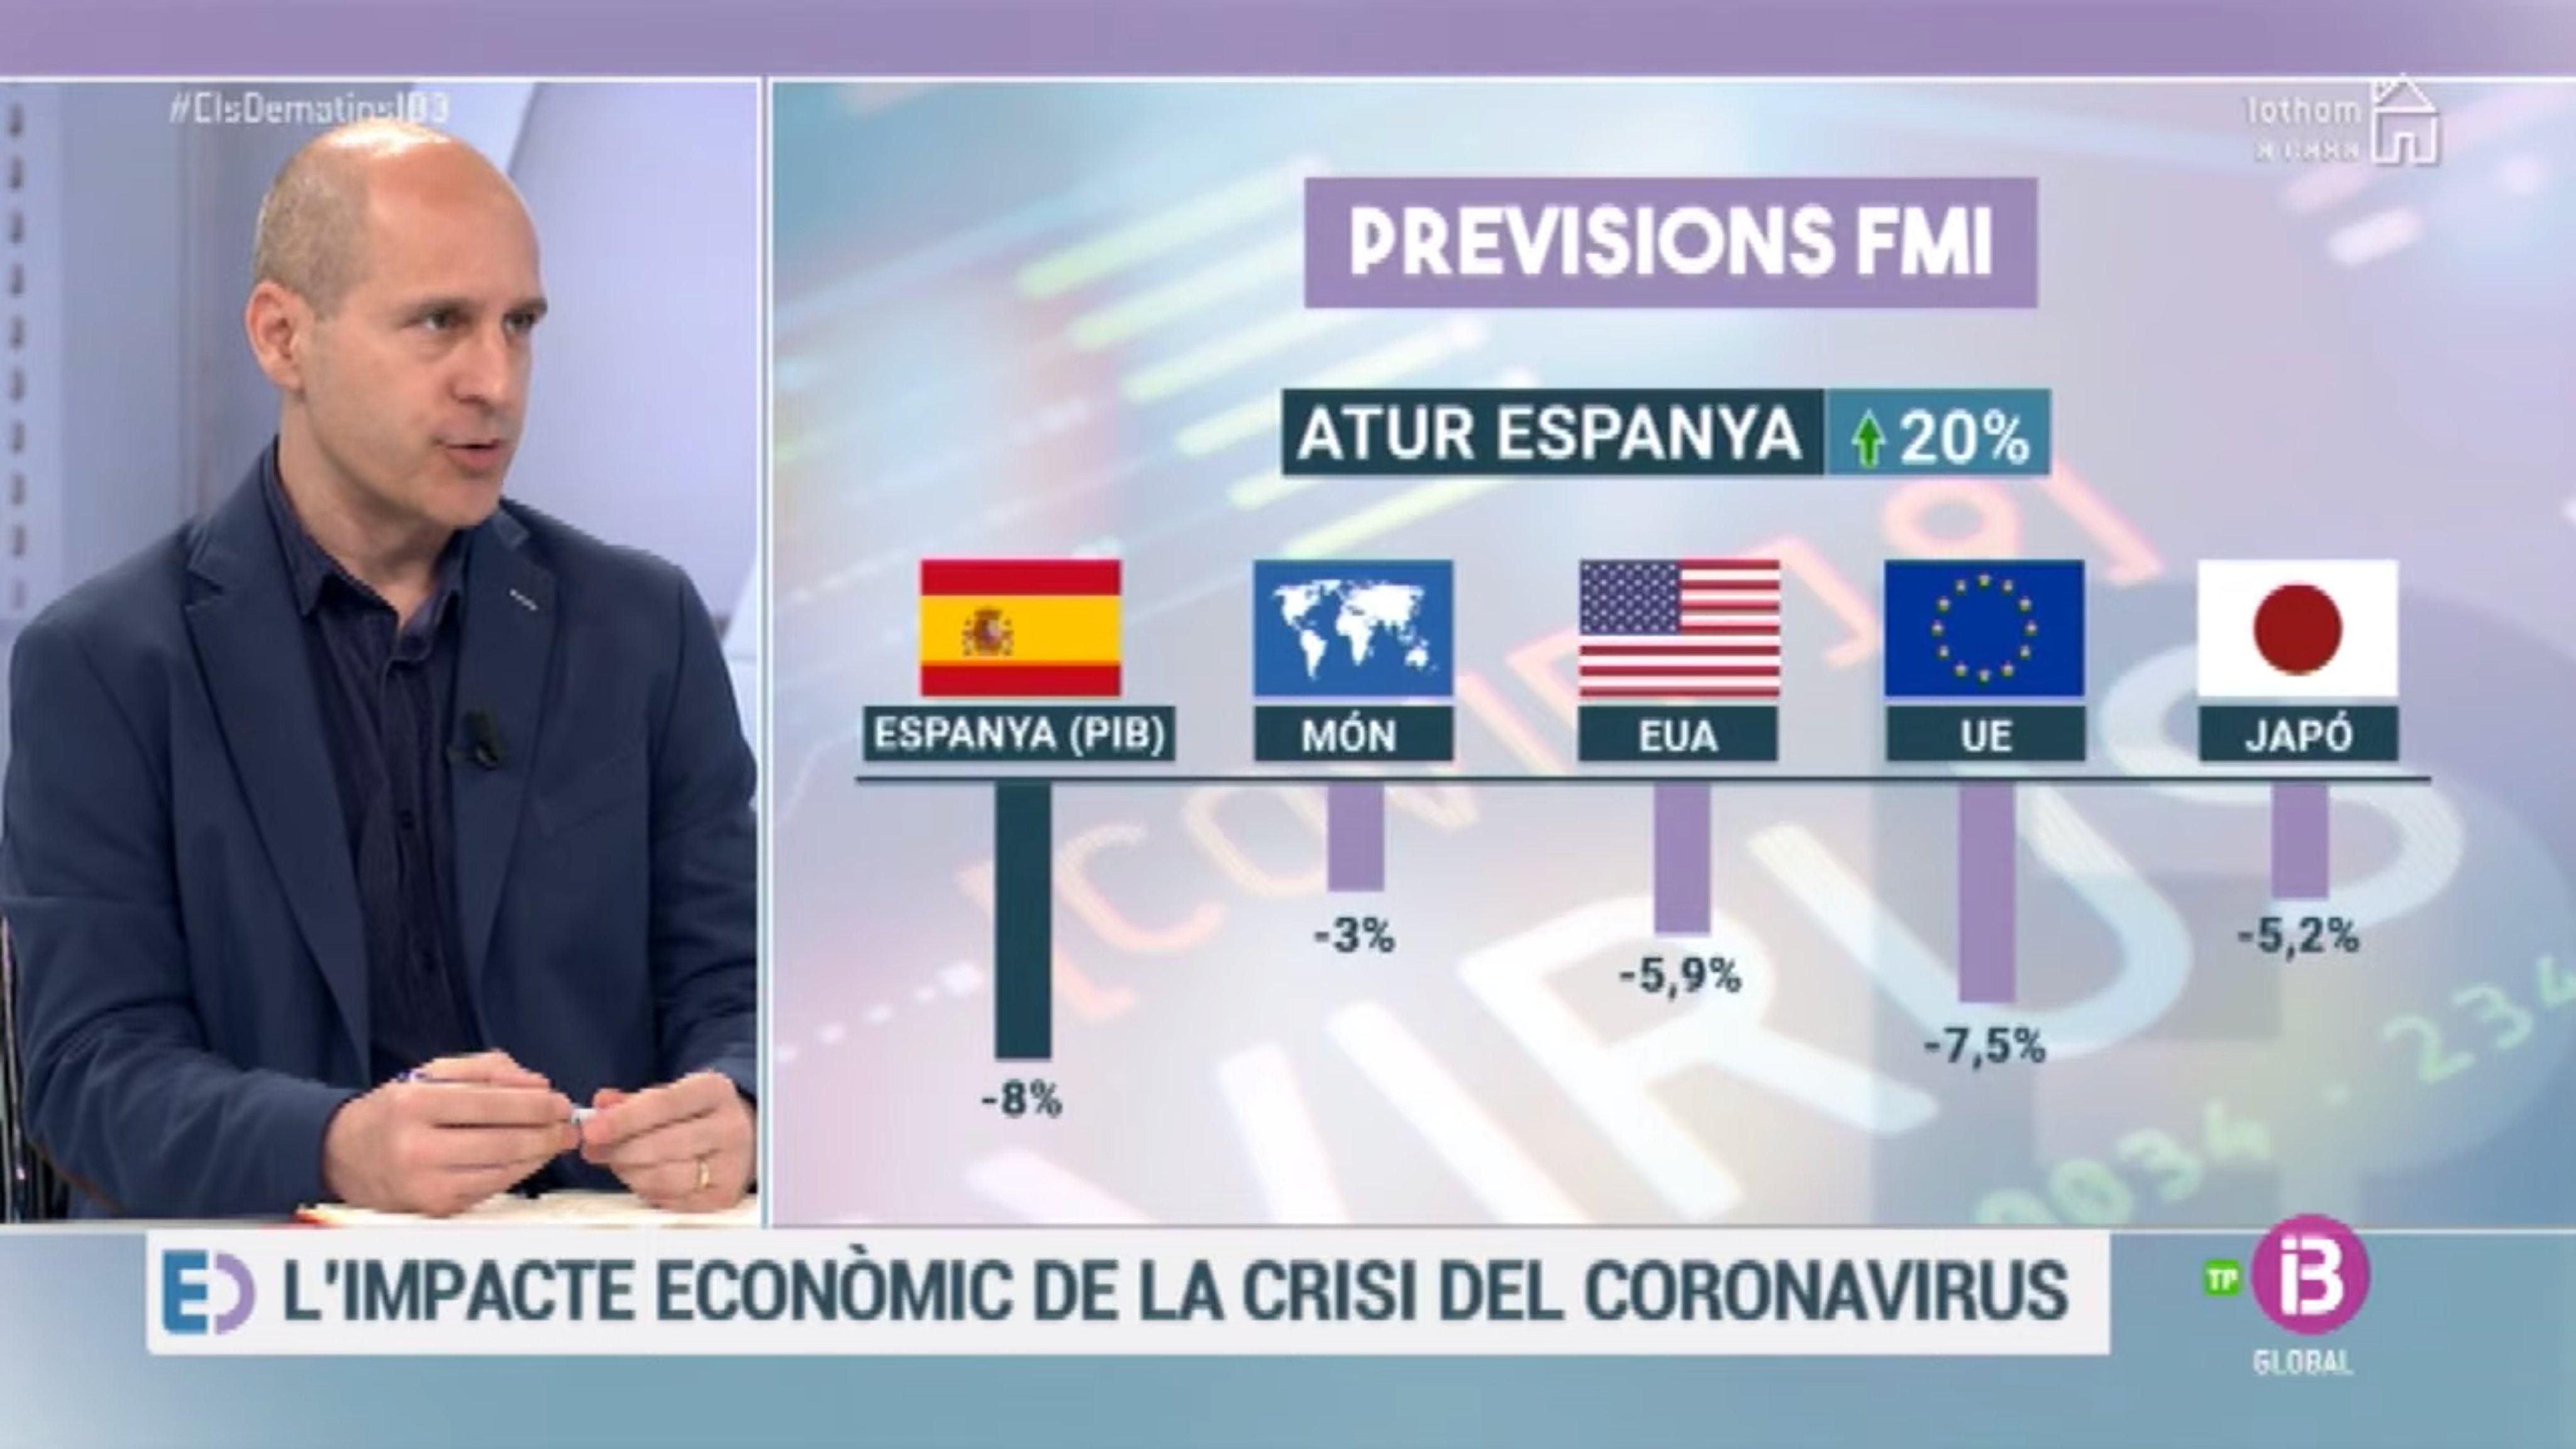 Previsiones FMI del PIB 2020